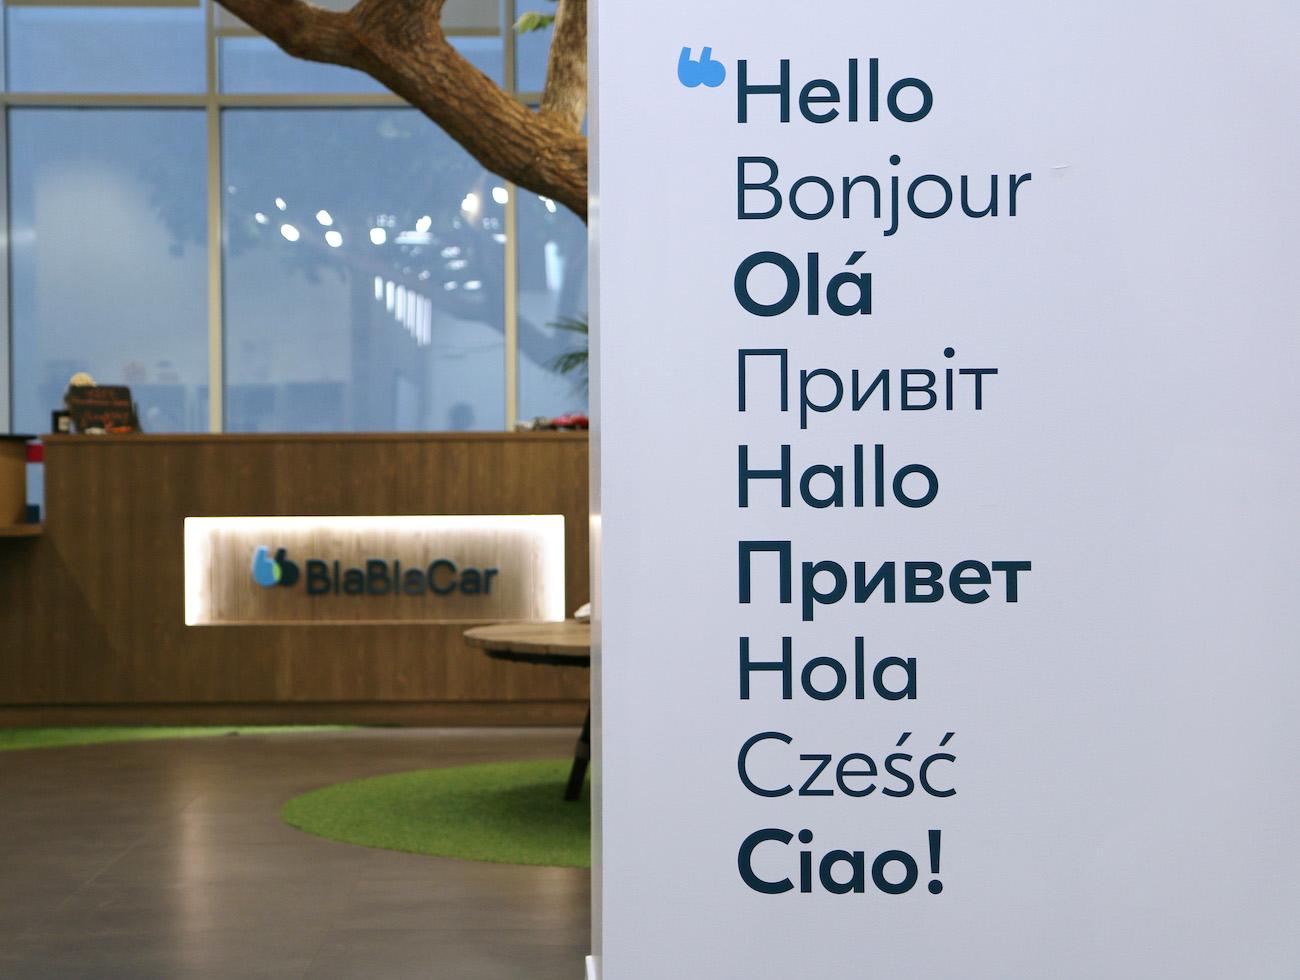 Офис BlaBlaCar во Франции